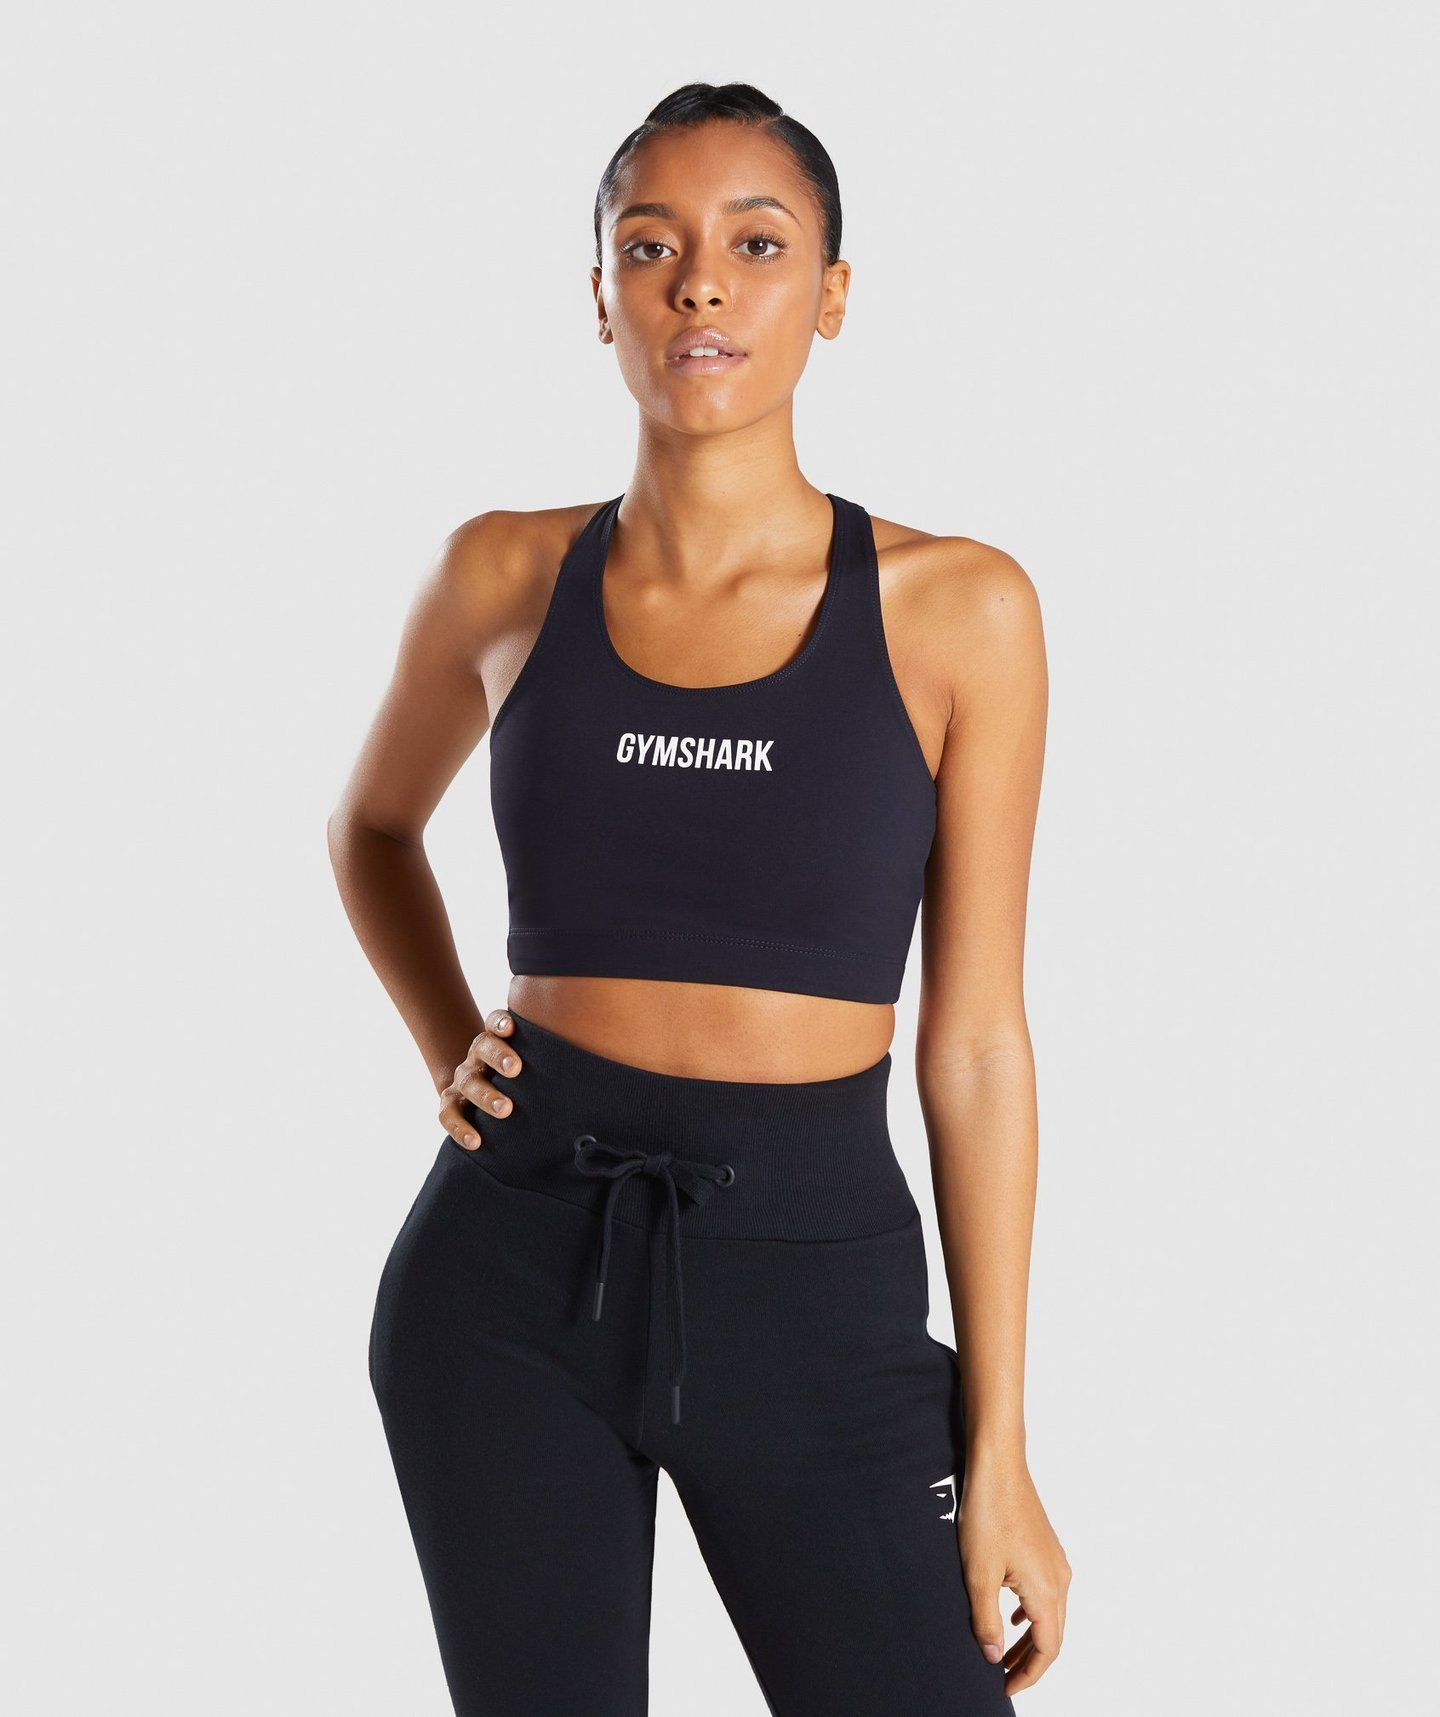 Gymshark Ark Sports Bra Black (With images) Trendy